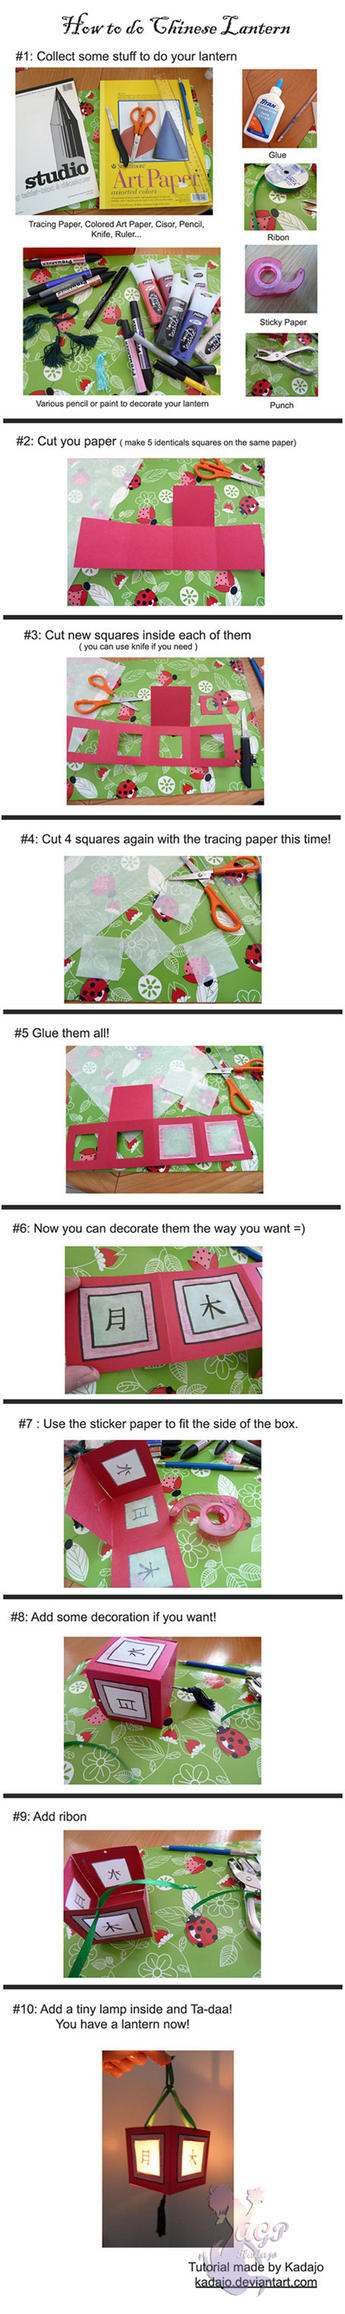 How to do Chinese Lantern - tutorial by Kadajo